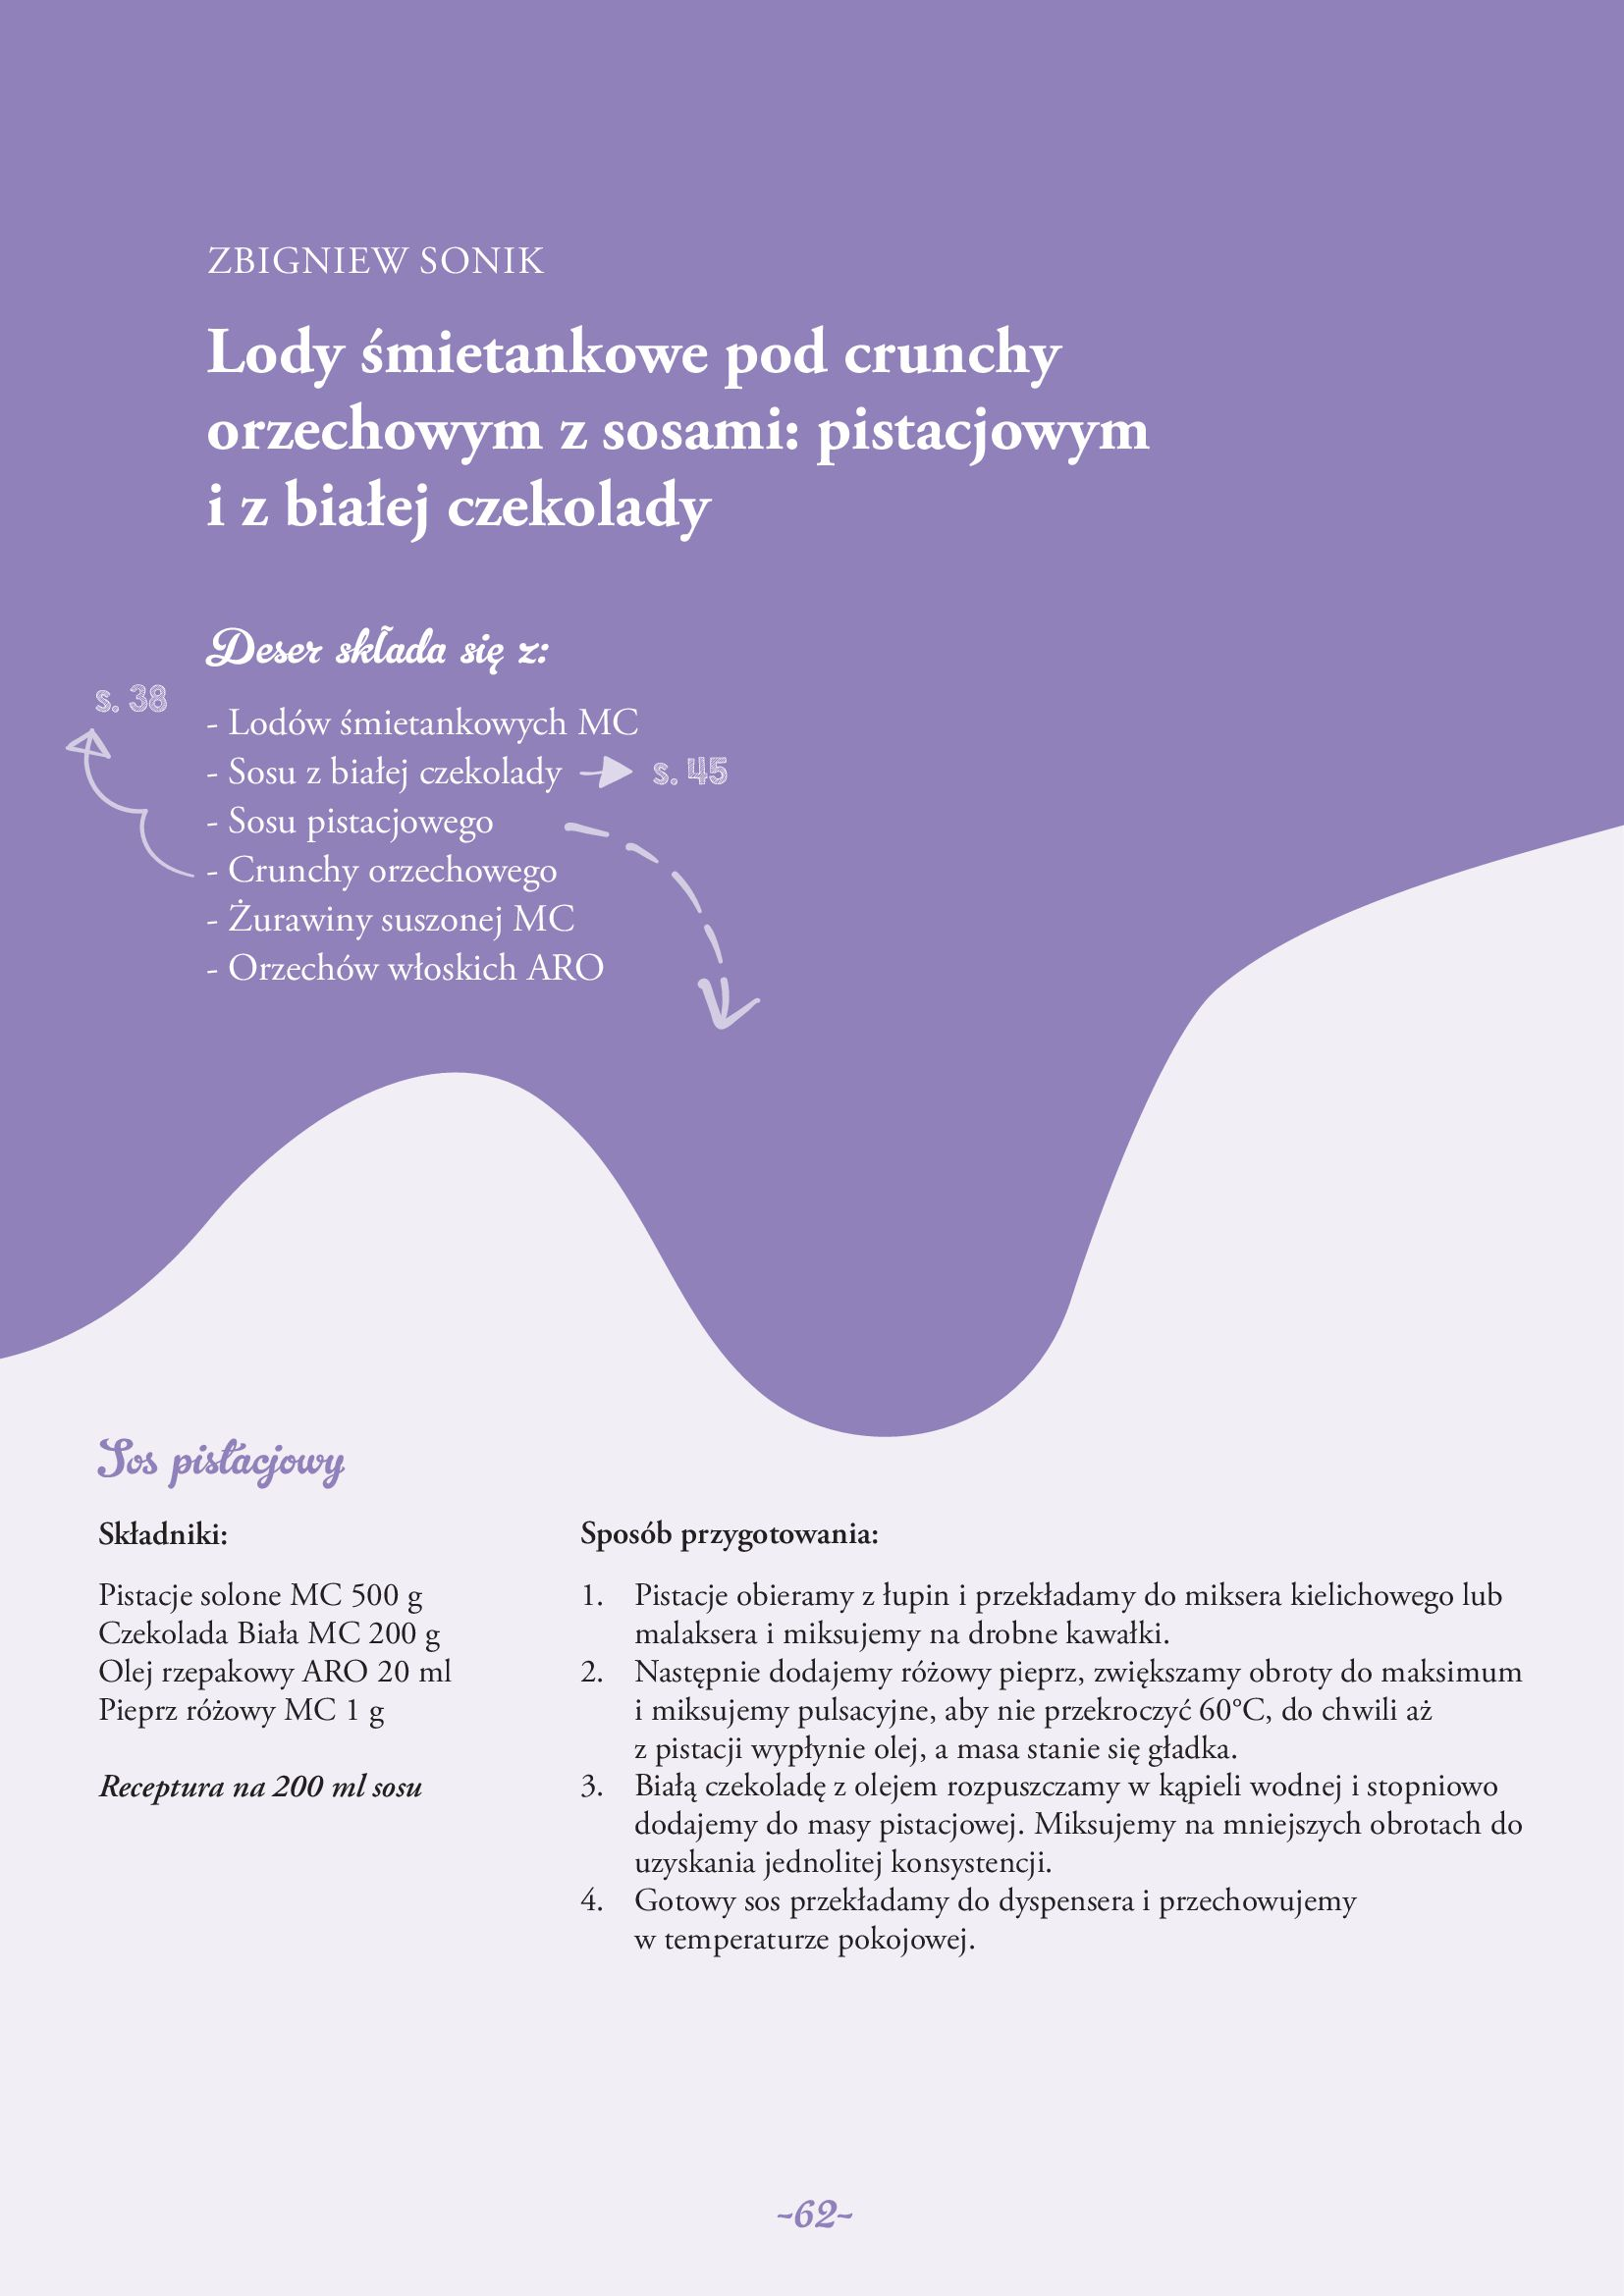 Gazetka Makro: Gazetka Makro - lody i desery 2021-05-21 page-62